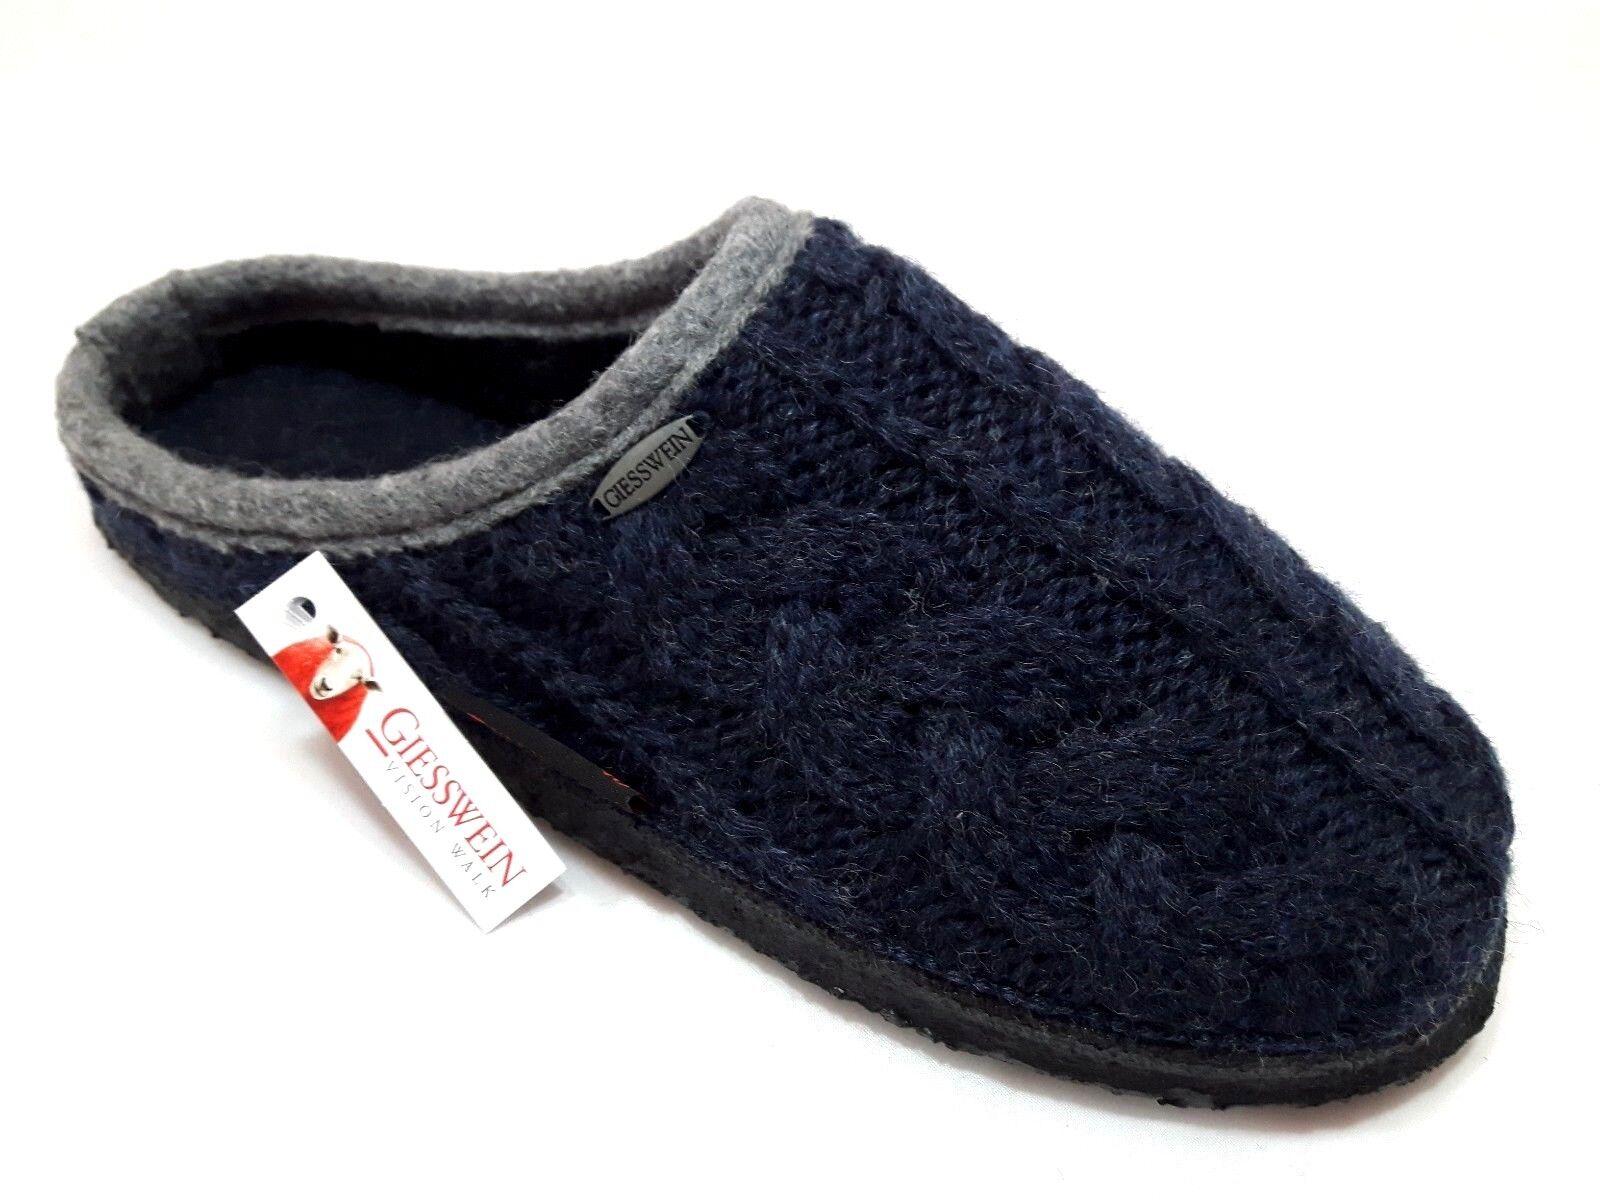 Ciabatte pantofole donna uomo uomo donna GIESSWEIN Neudau blu notte lana maglia treccia ca415a